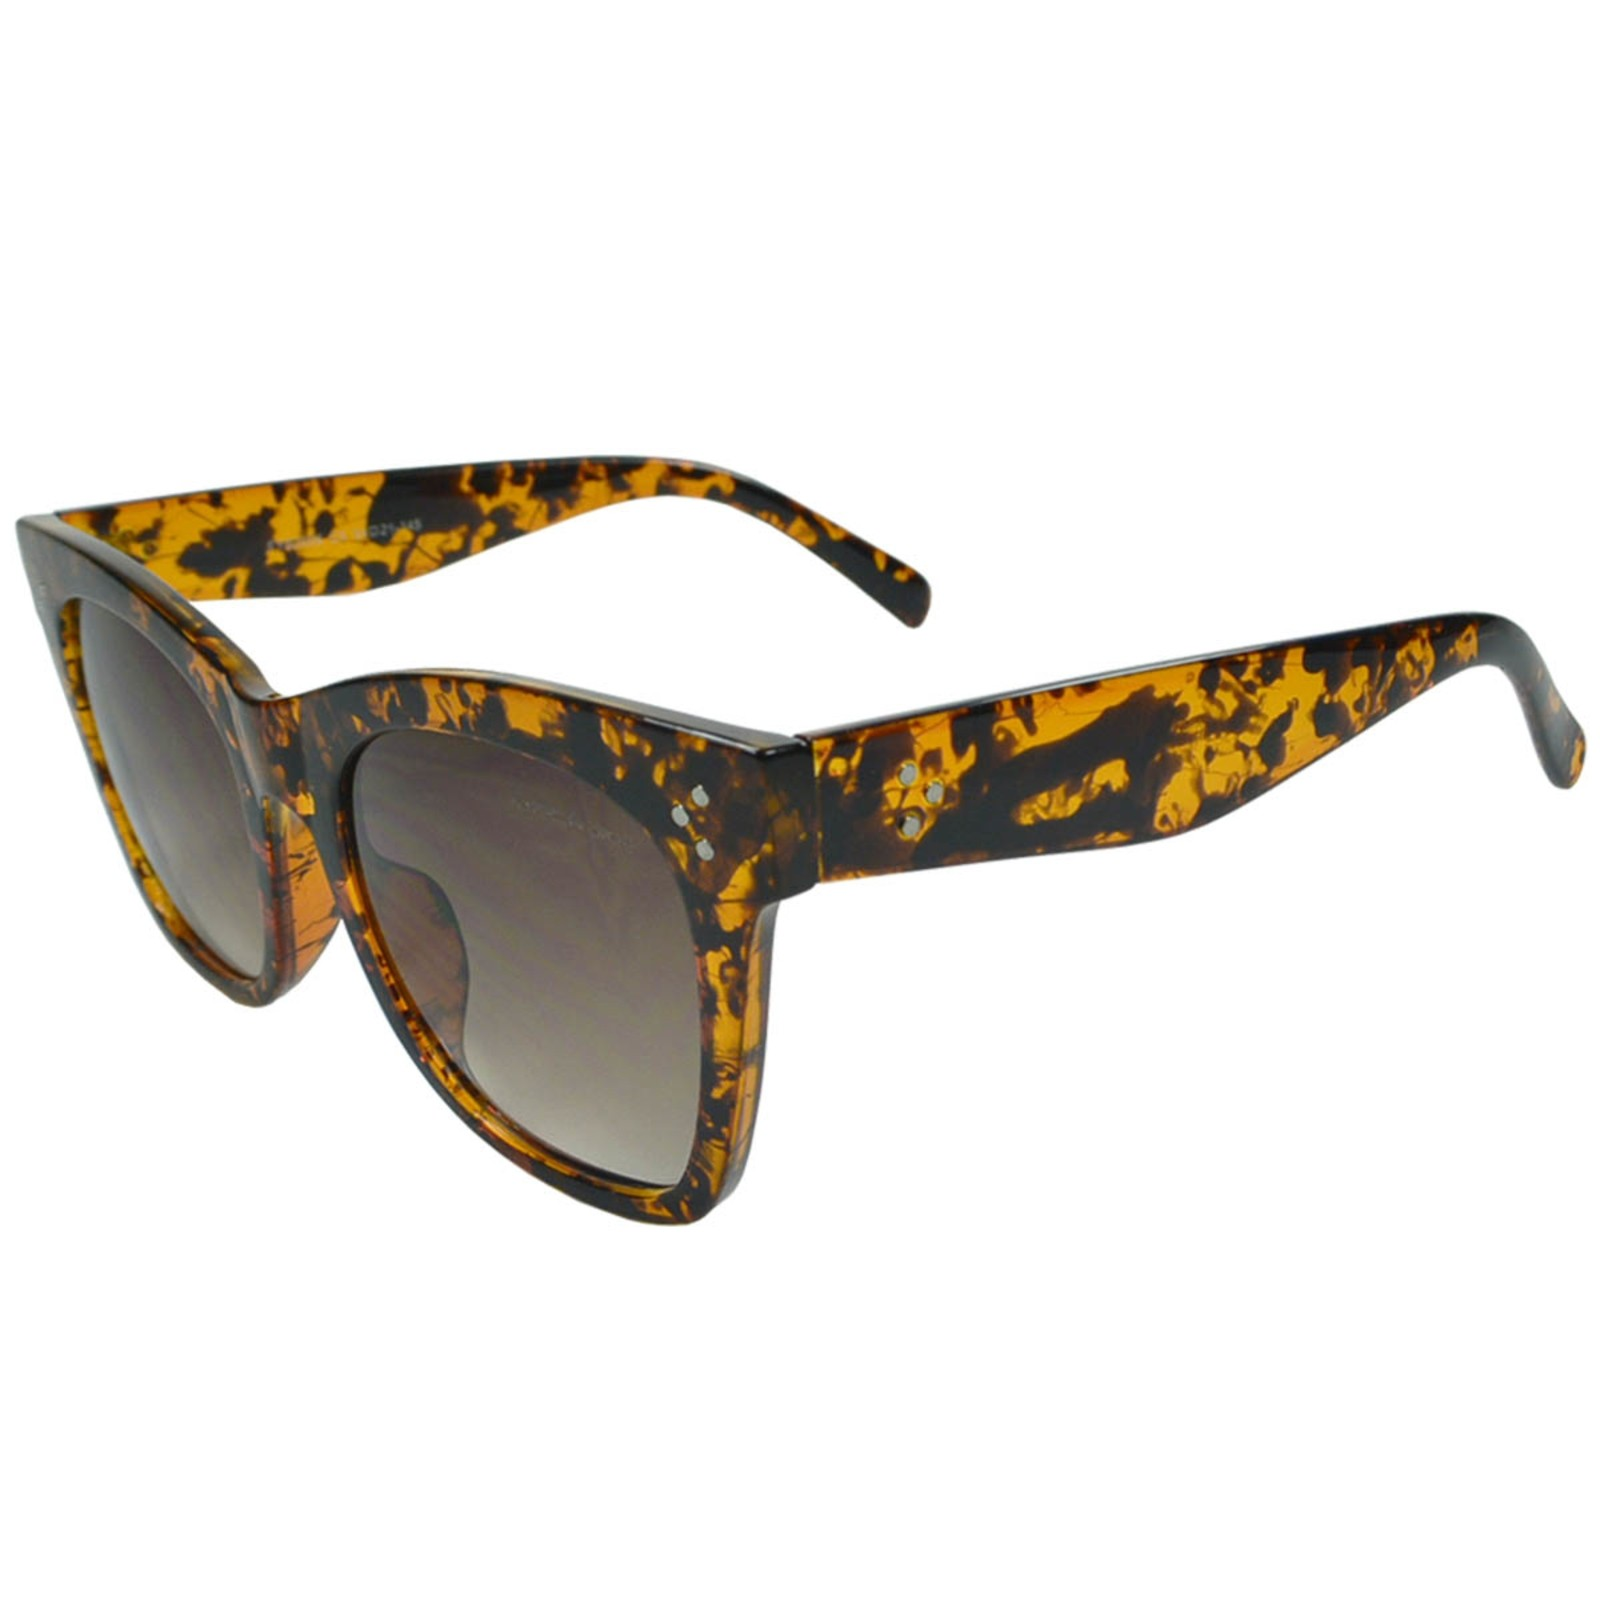 Óculos De Sol Mackage Feminino Acetato Oversize Quadrado Retrô - Tarta